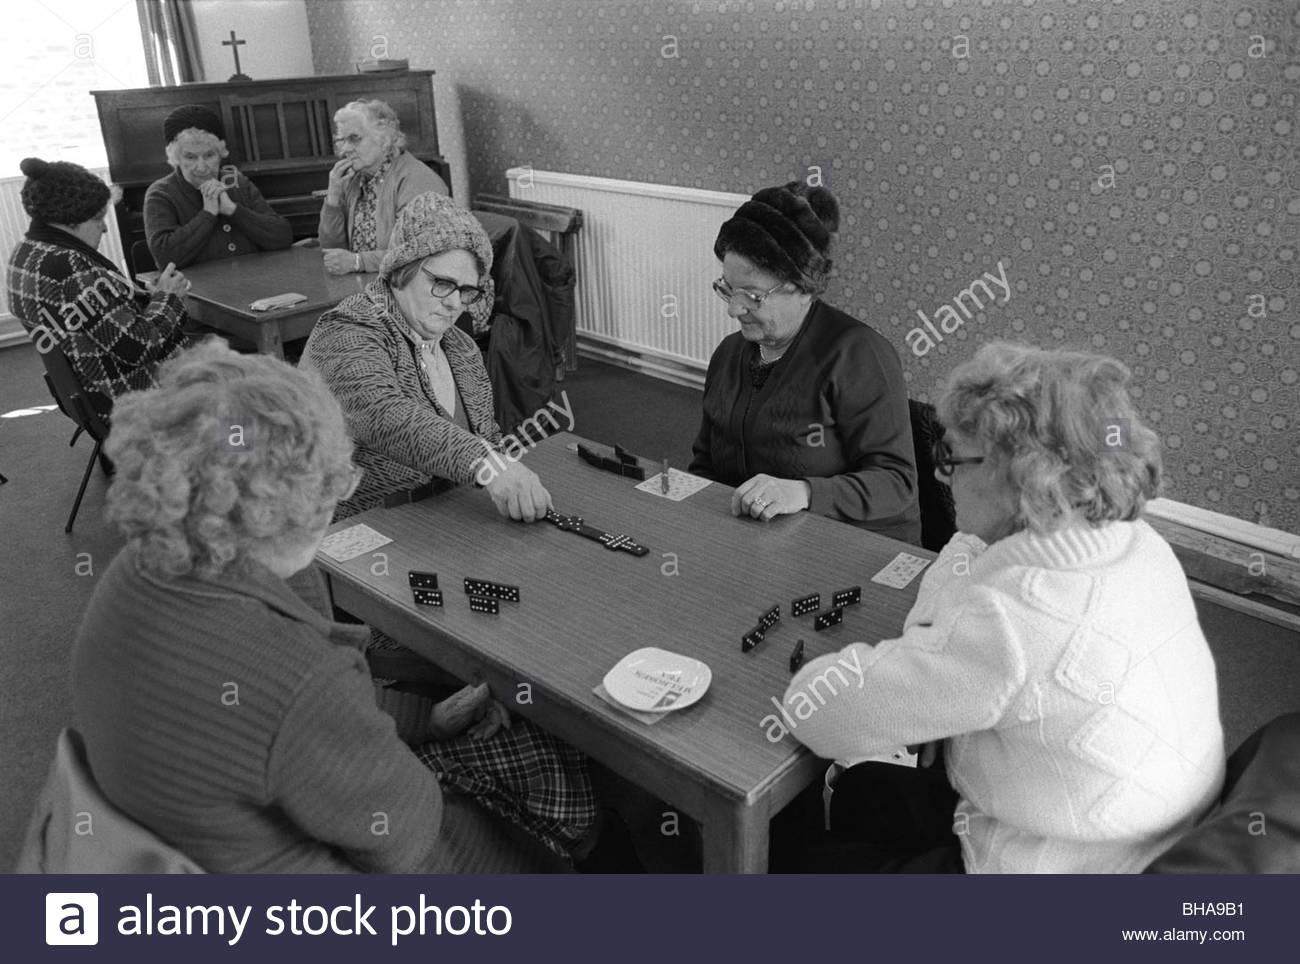 Cerca de Saltaire Bradford Shipley West Yorkshire, Inglaterra, 1981. HOMER SYKES Imagen De Stock